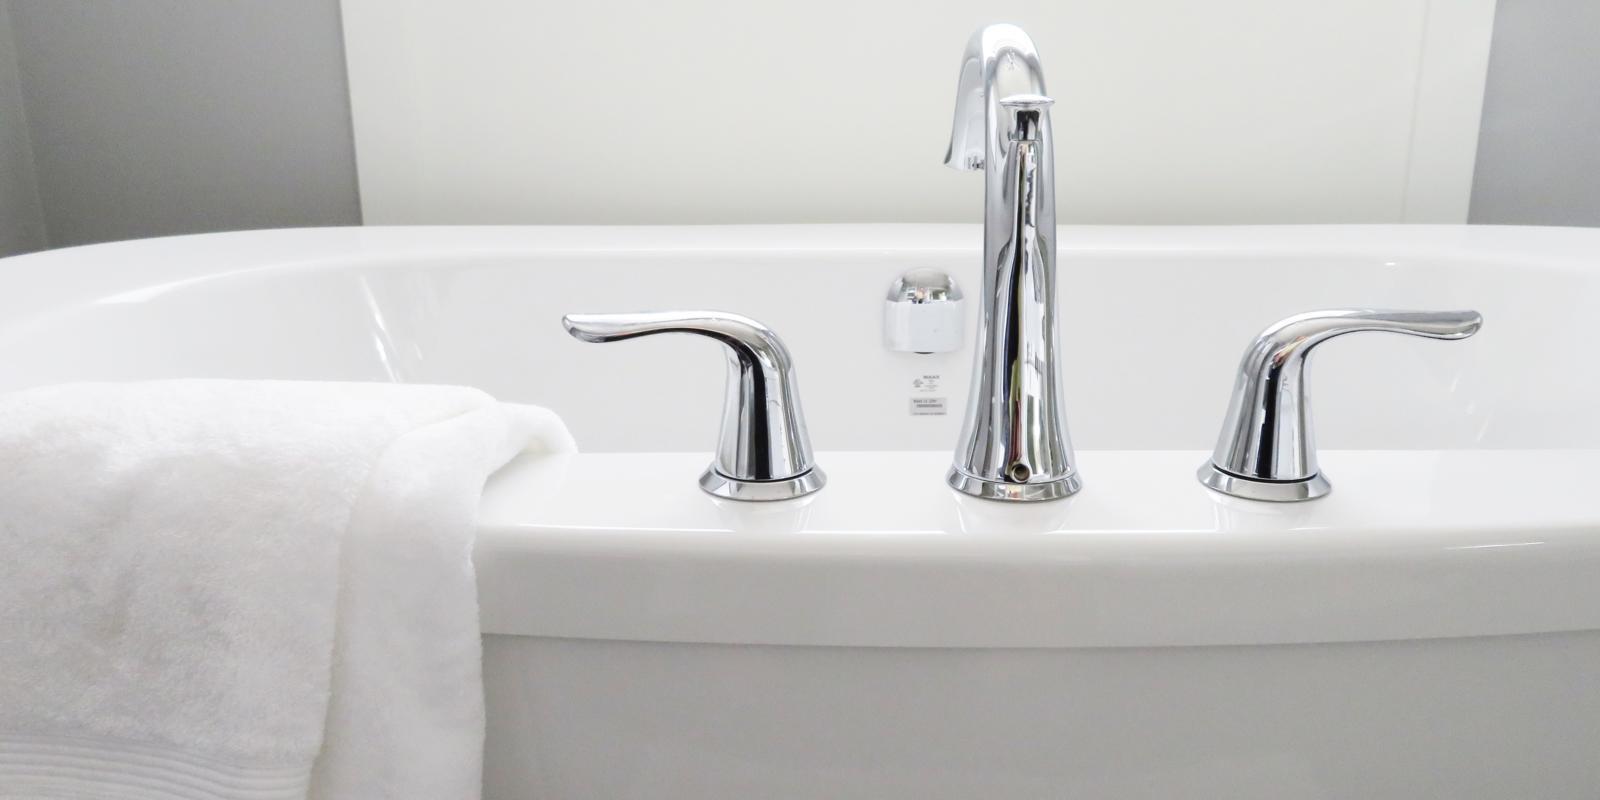 badkraan op badrand